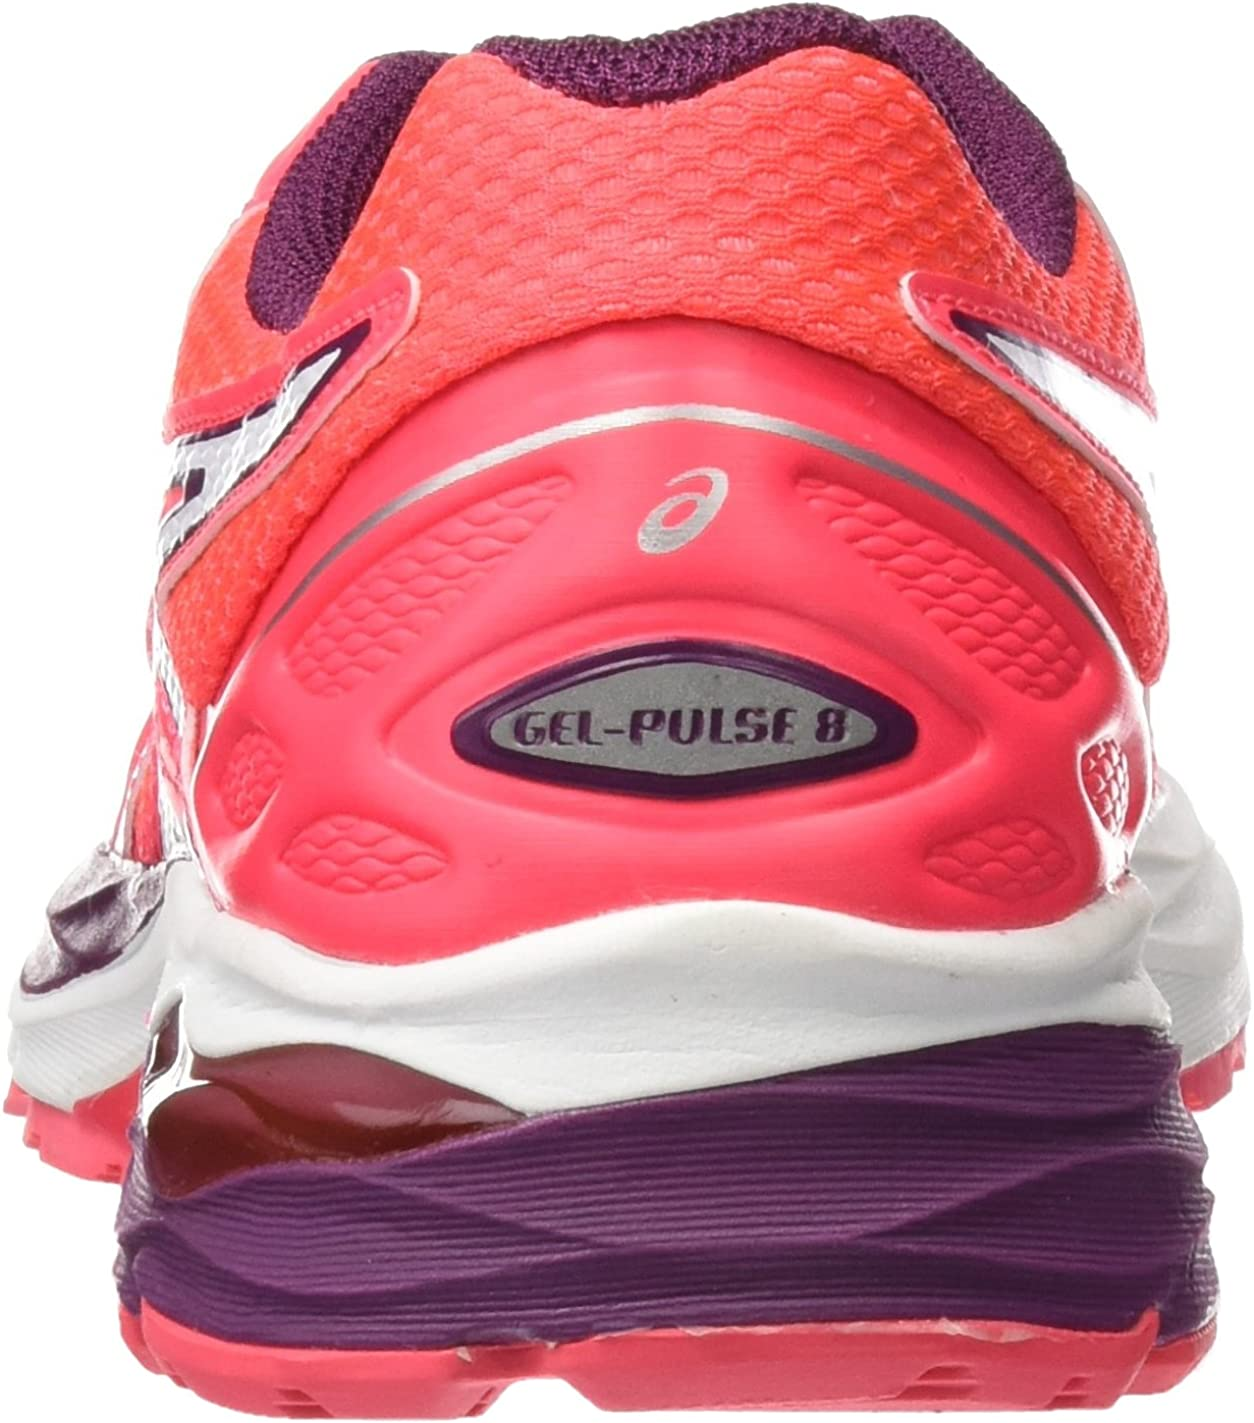 Won Nuevo significado ropa interior  Asics Gel-pulse 8, Zapatillas De Running Para Mujer Rosa Diva Pink White  Dark Purple